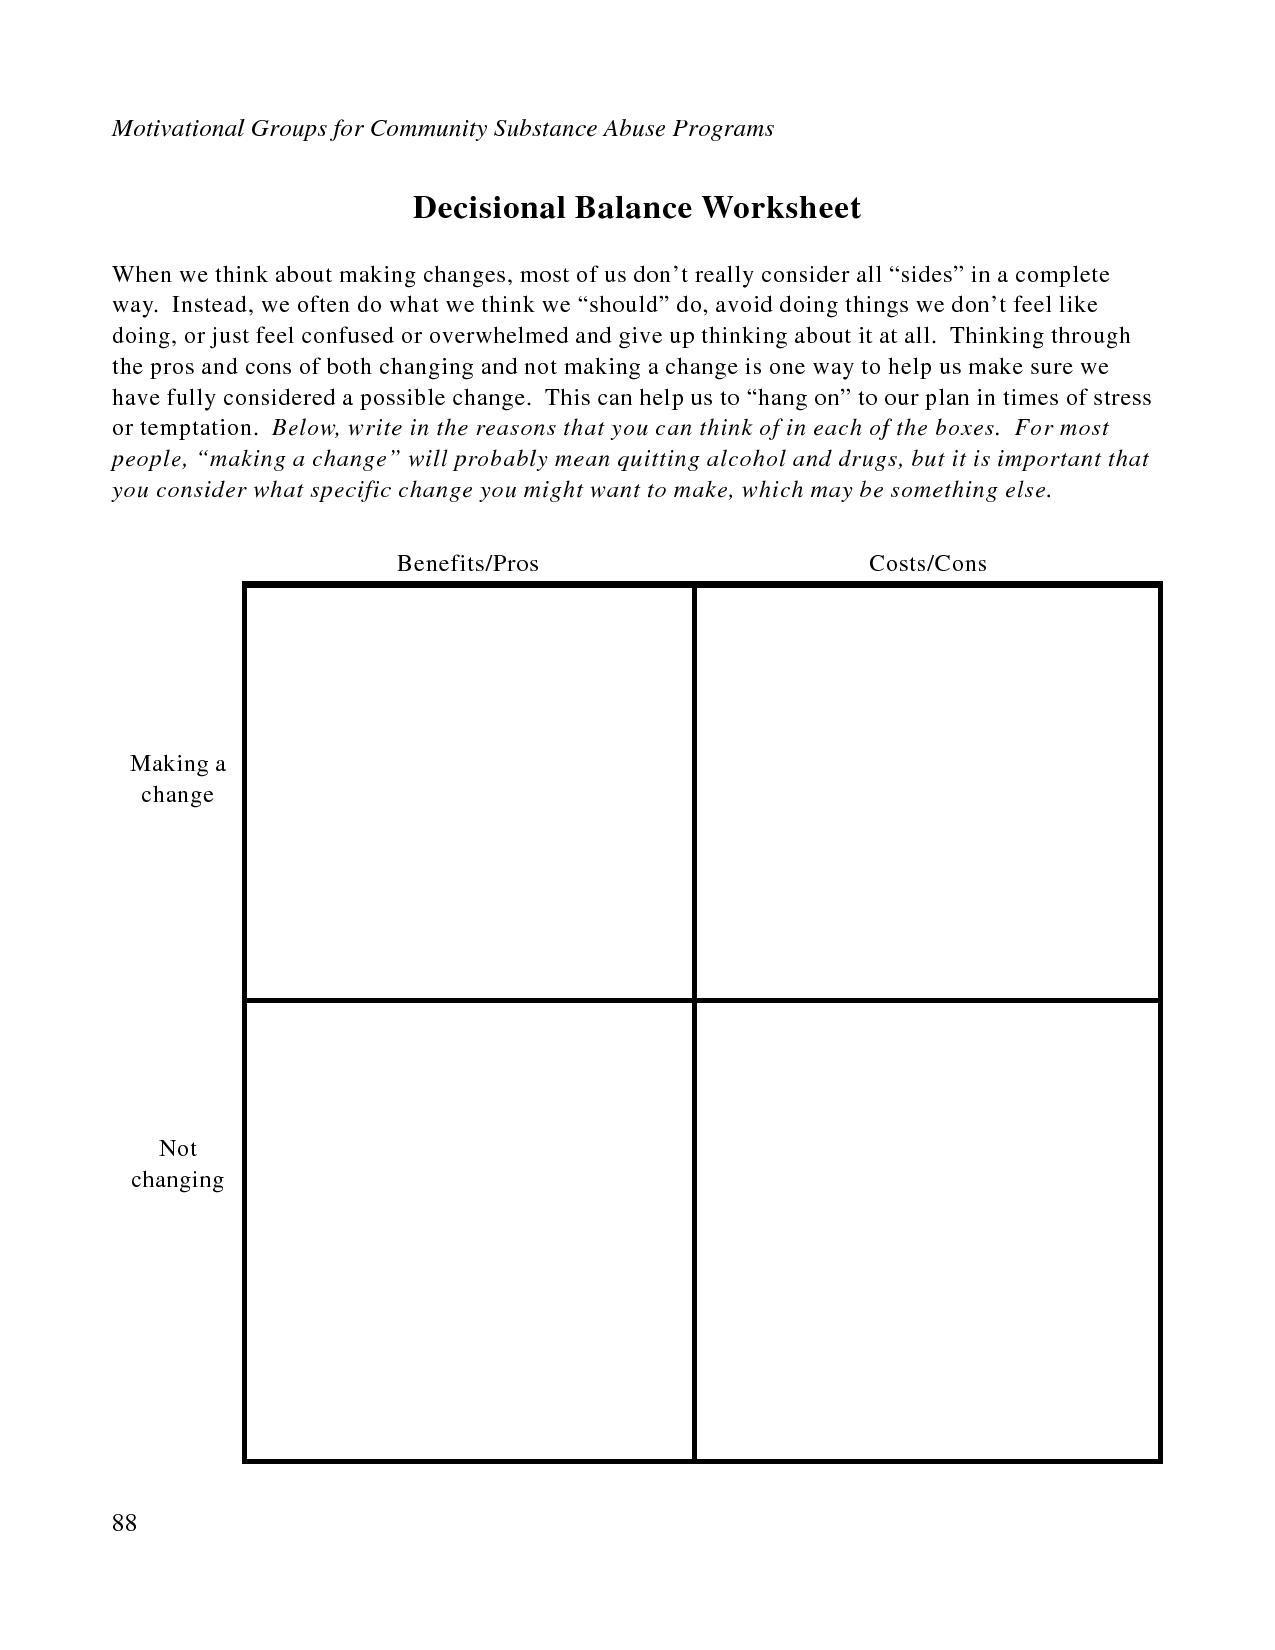 Free Printable Dbt Worksheets | Decisional Balance Worksheet - Pdf - Free Printable Worksheets On Depression